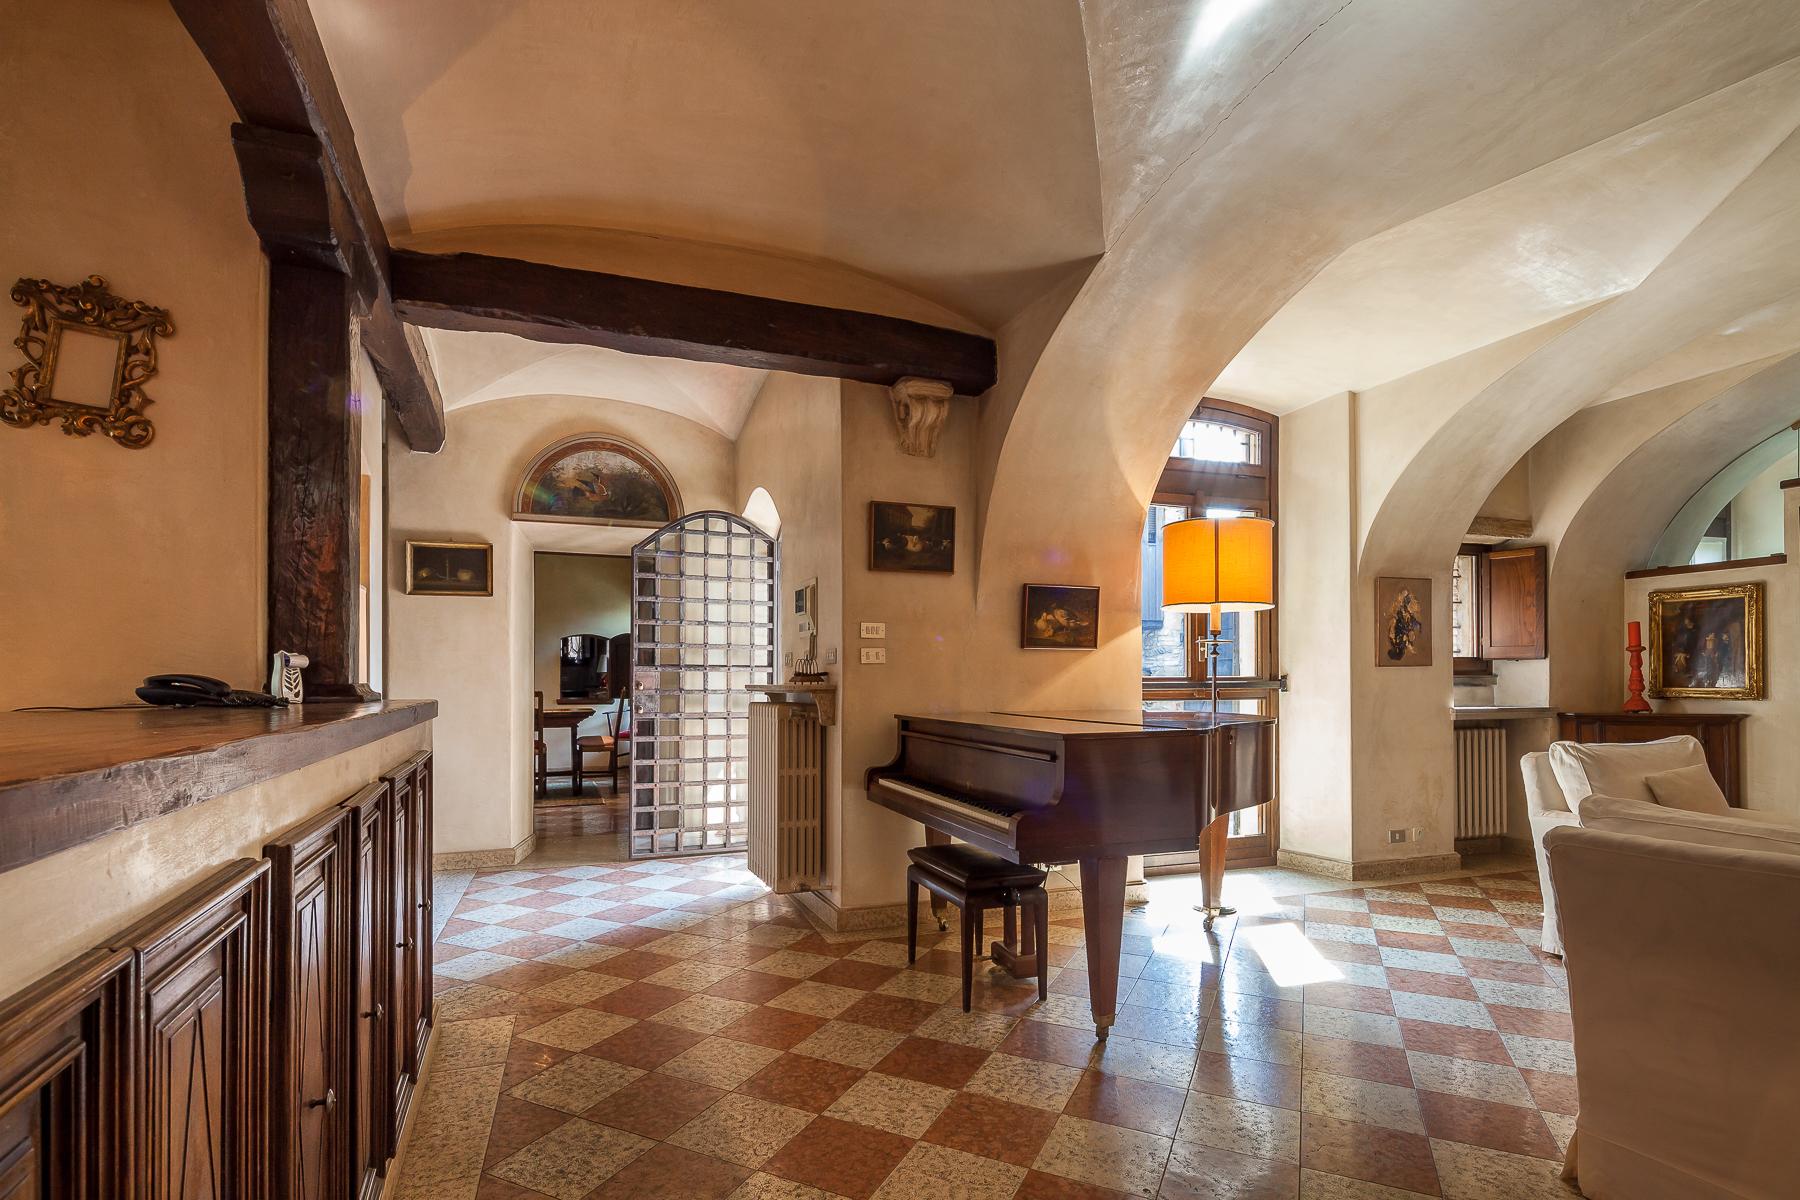 Villa in Vendita a Gorle: 5 locali, 850 mq - Foto 5